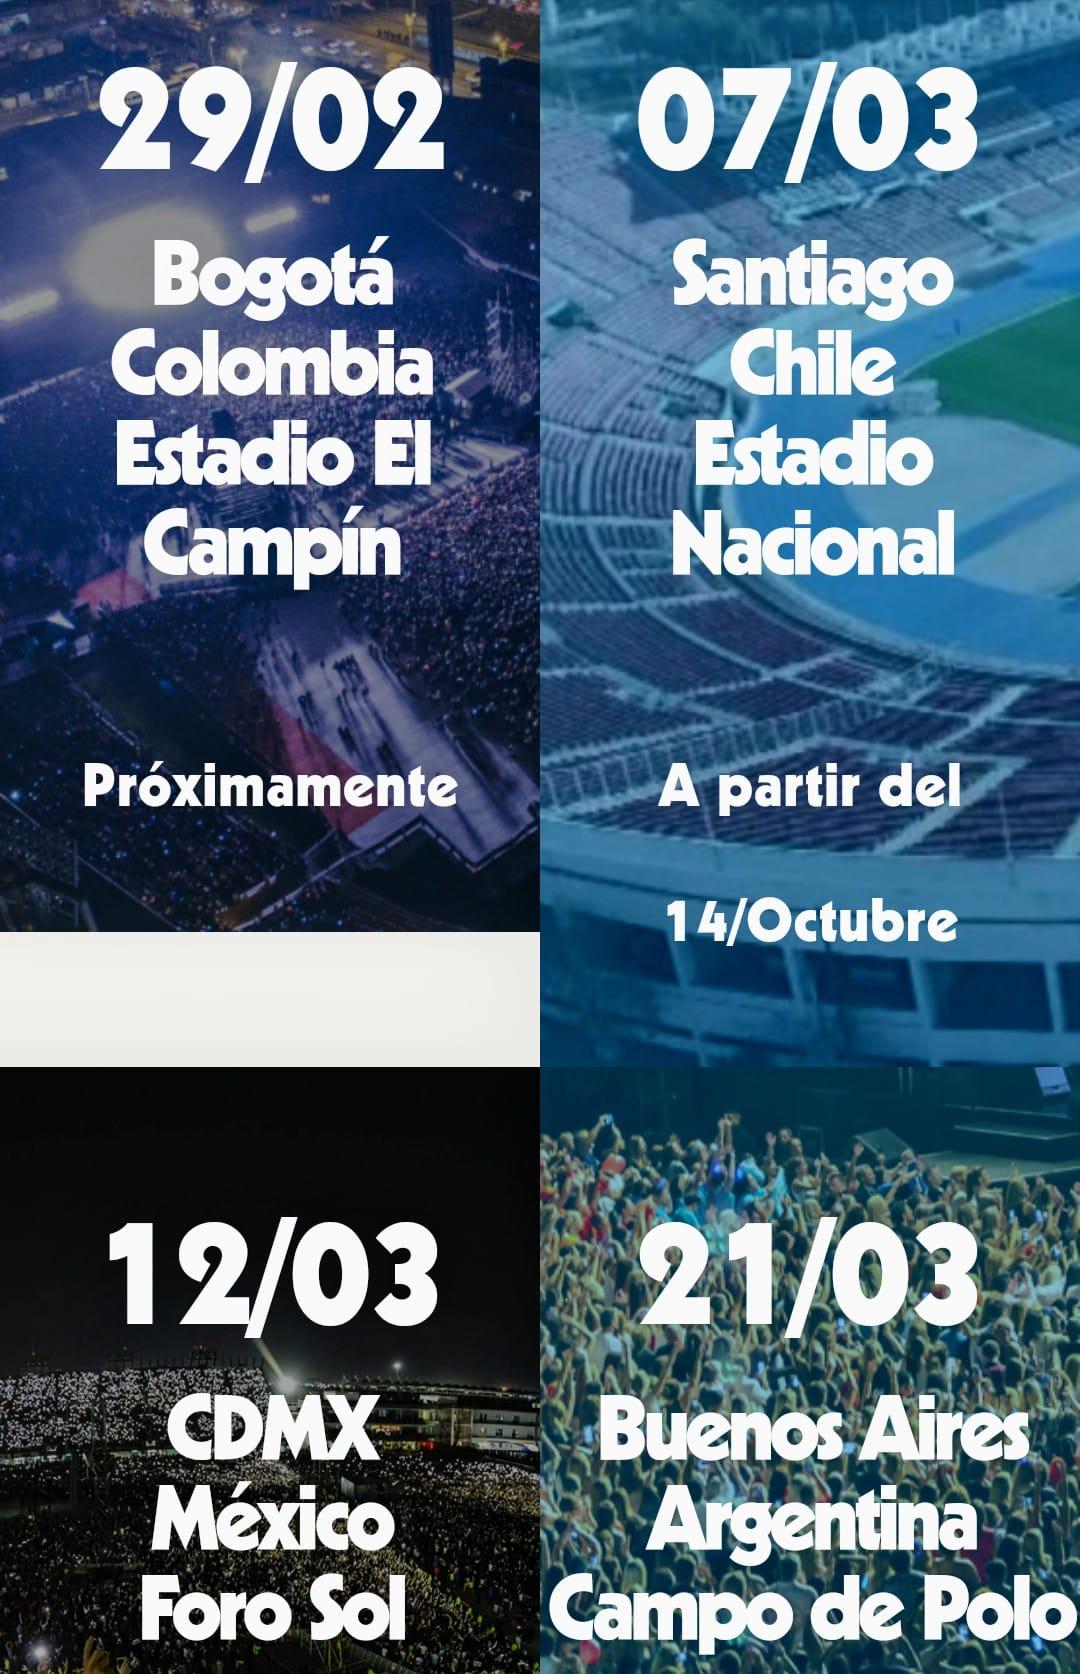 Concierto en México de soda Stereo